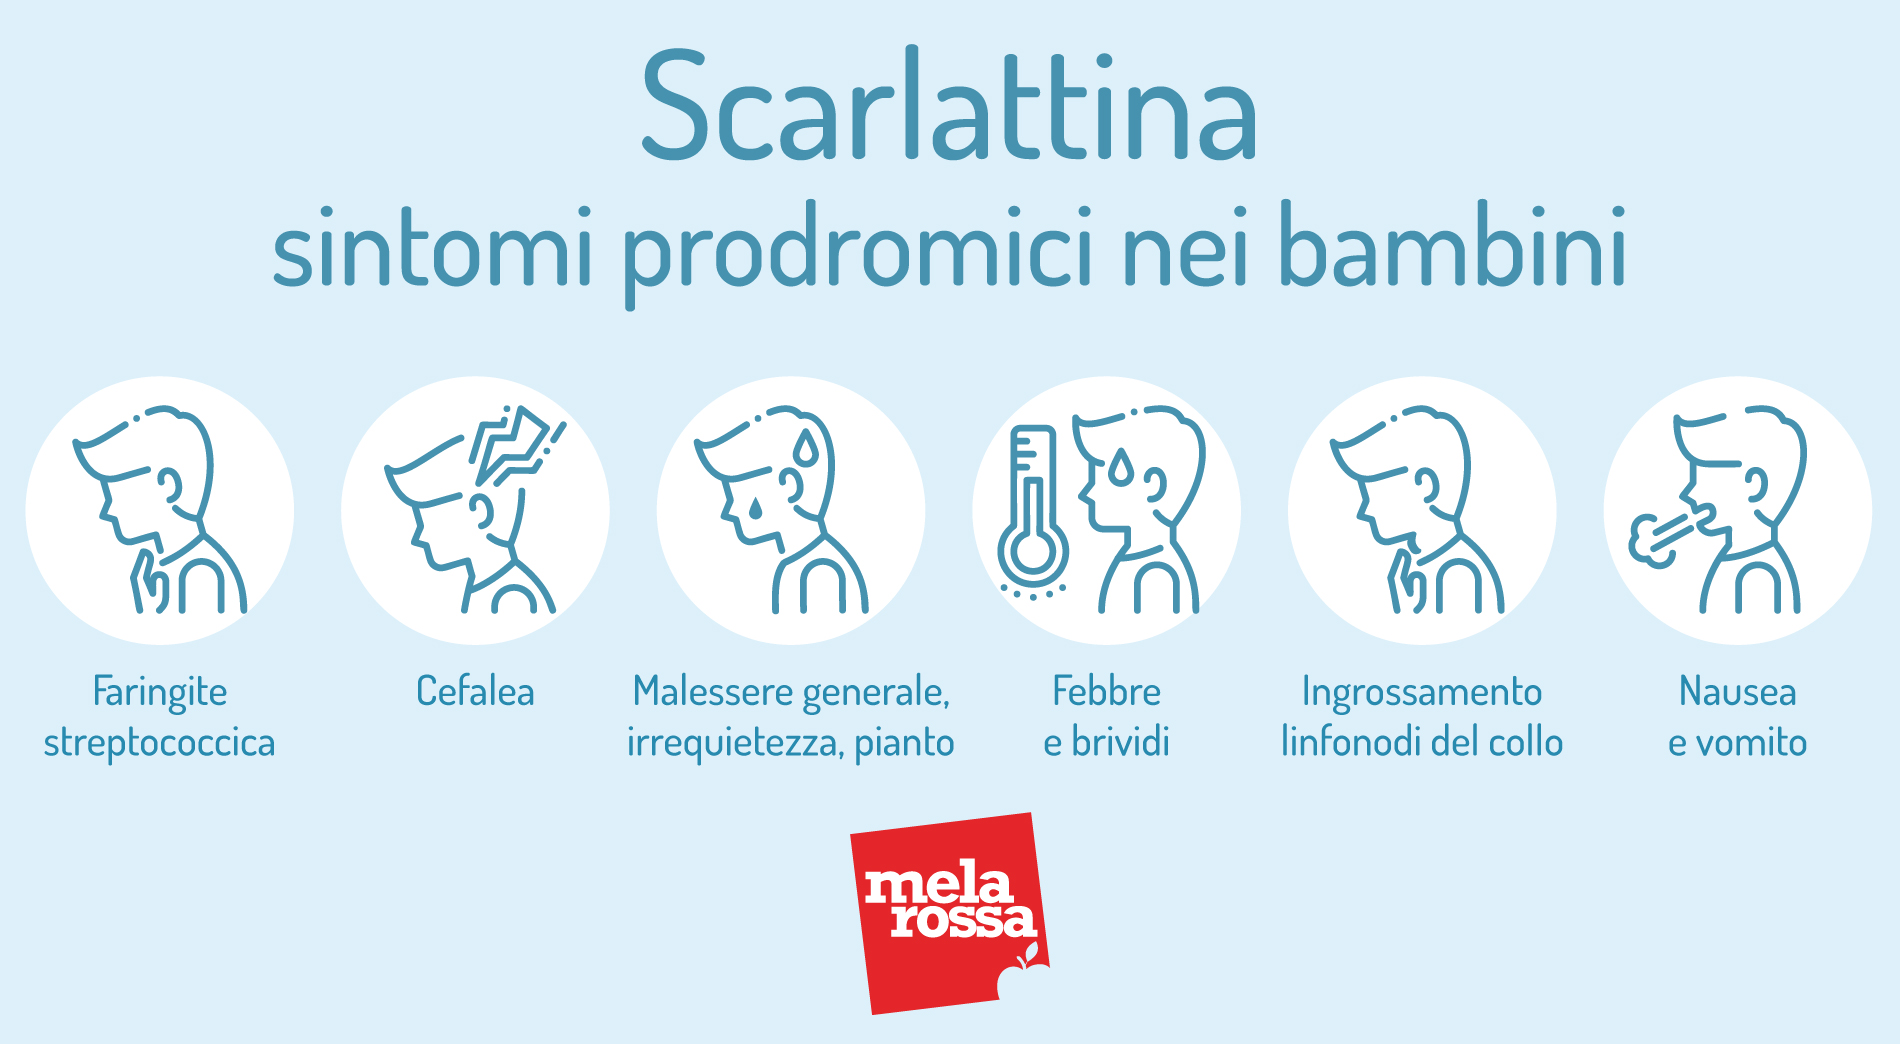 Scarlattina: sintomi nei bambini